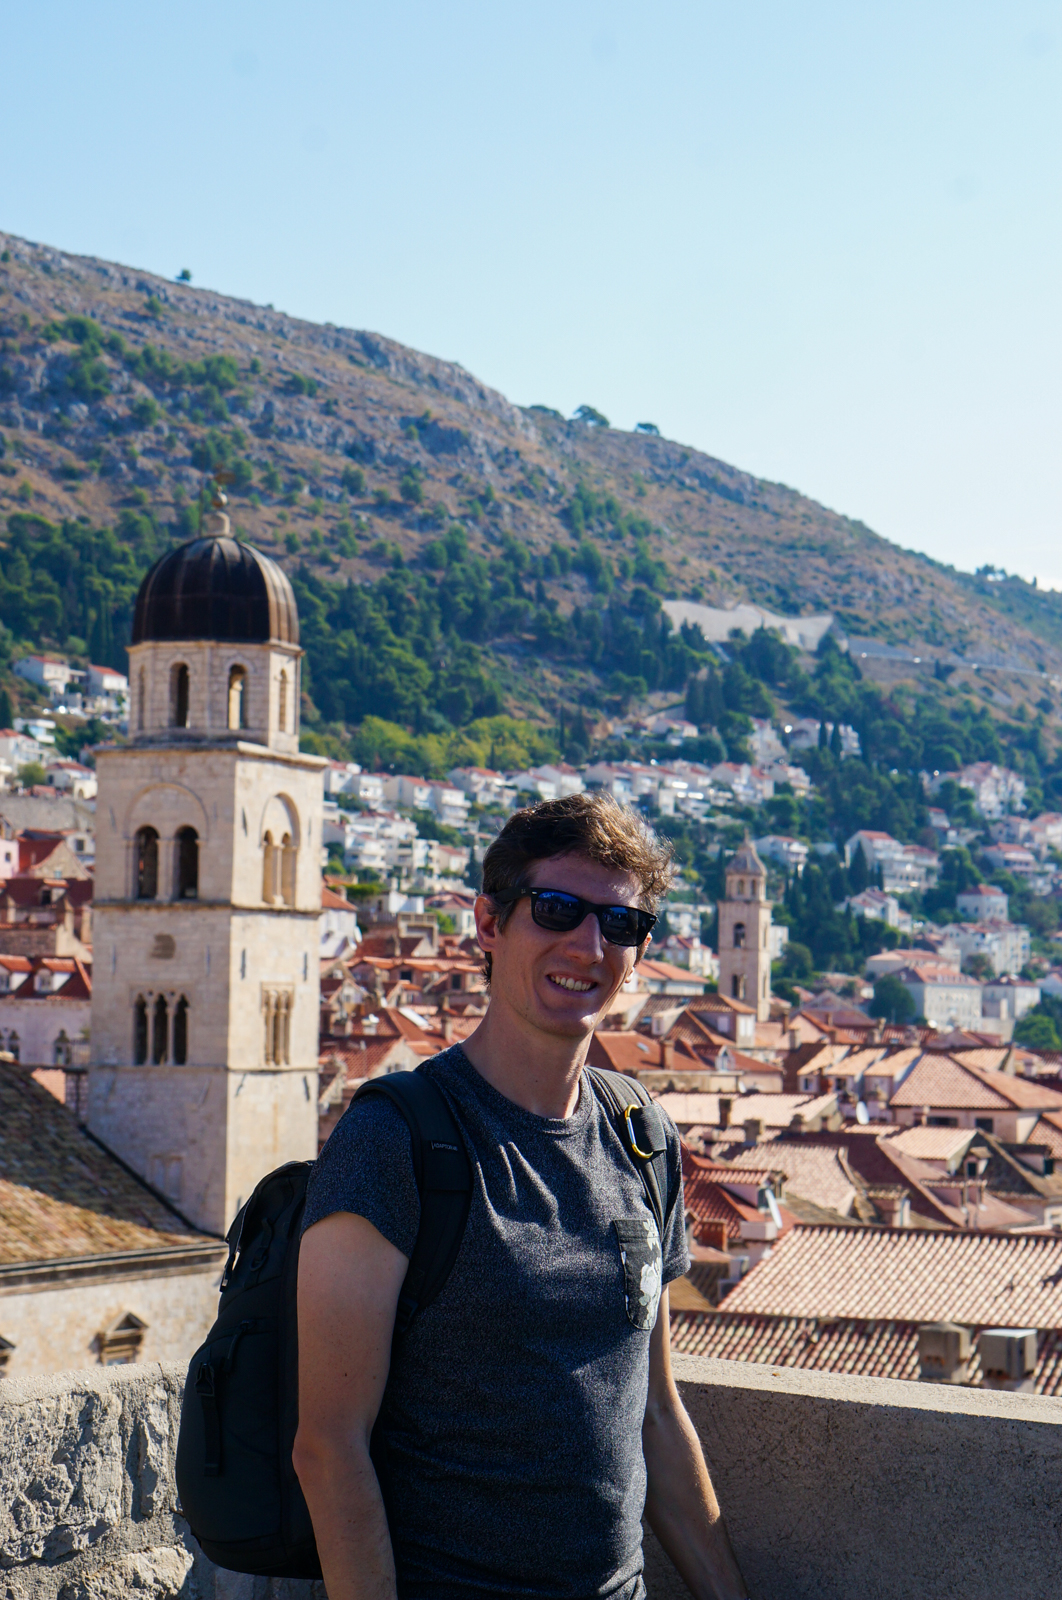 dubrovnik, tourisme dubrovnik, dubrovnik septembre, voyage croatie, blog voyage craotie, croatie 2017, blog voyage croatie 2018, croatie 2018